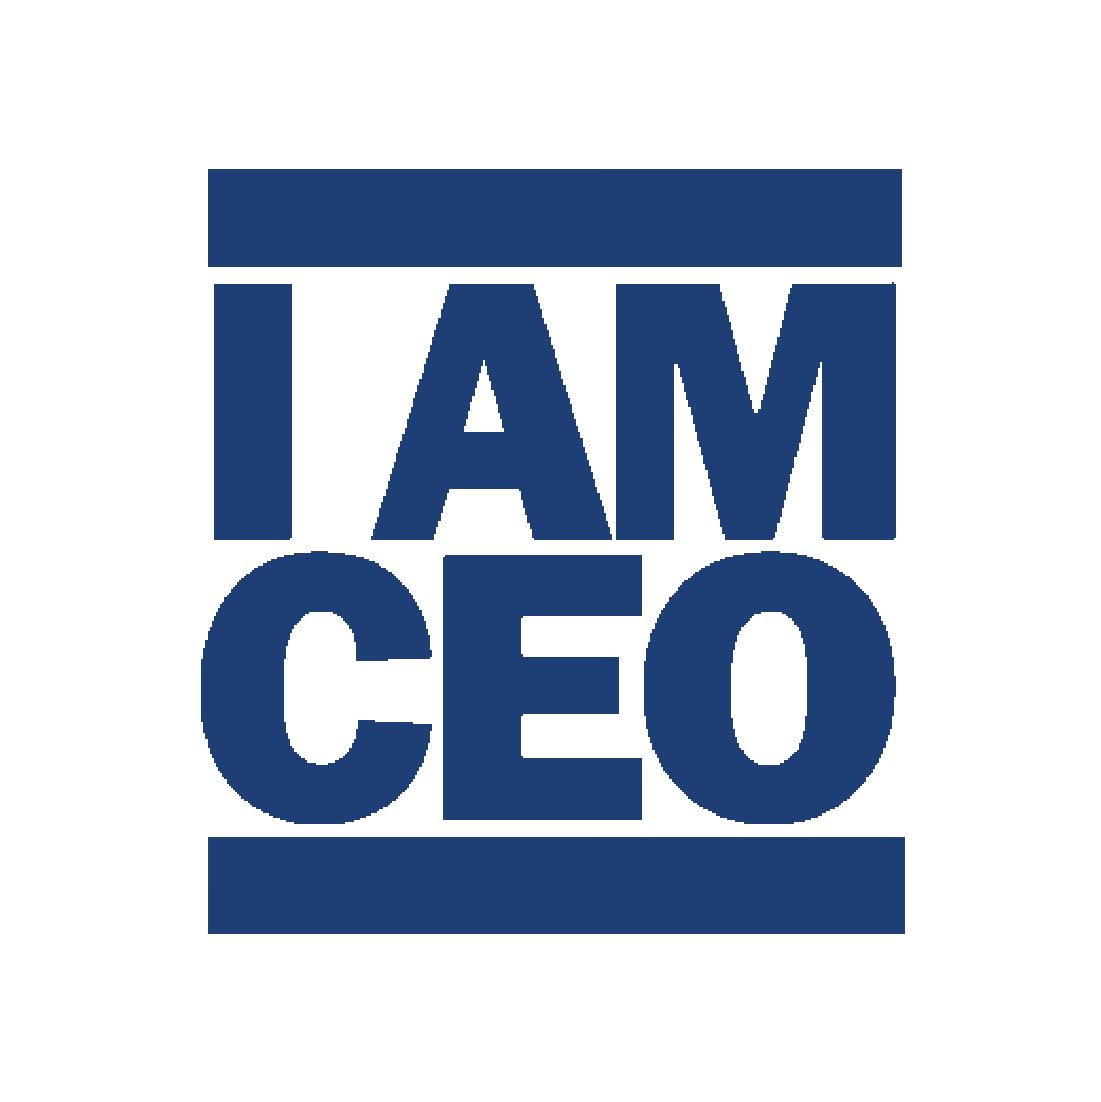 ASC - Media Logos Blue-06.png